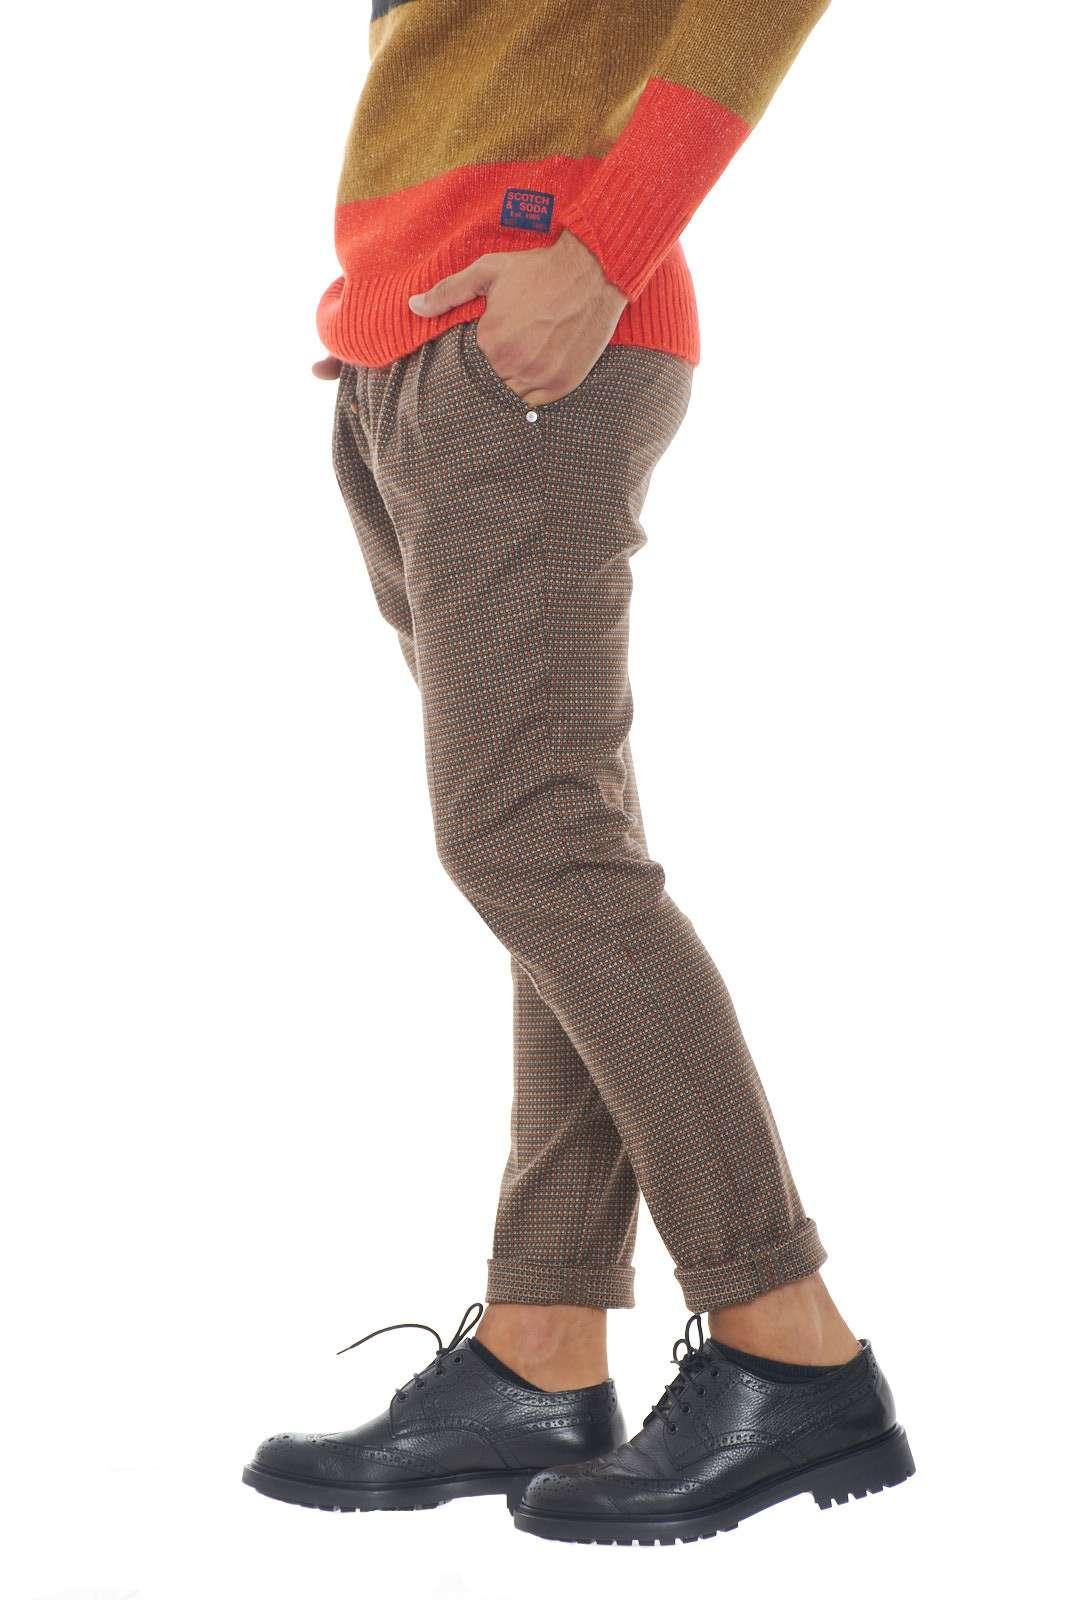 https://www.parmax.com/media/catalog/product/a/i/AI-outlet_parmax-pantaloni-uomo-Desica-FURORE%20CM%2004-B.jpg